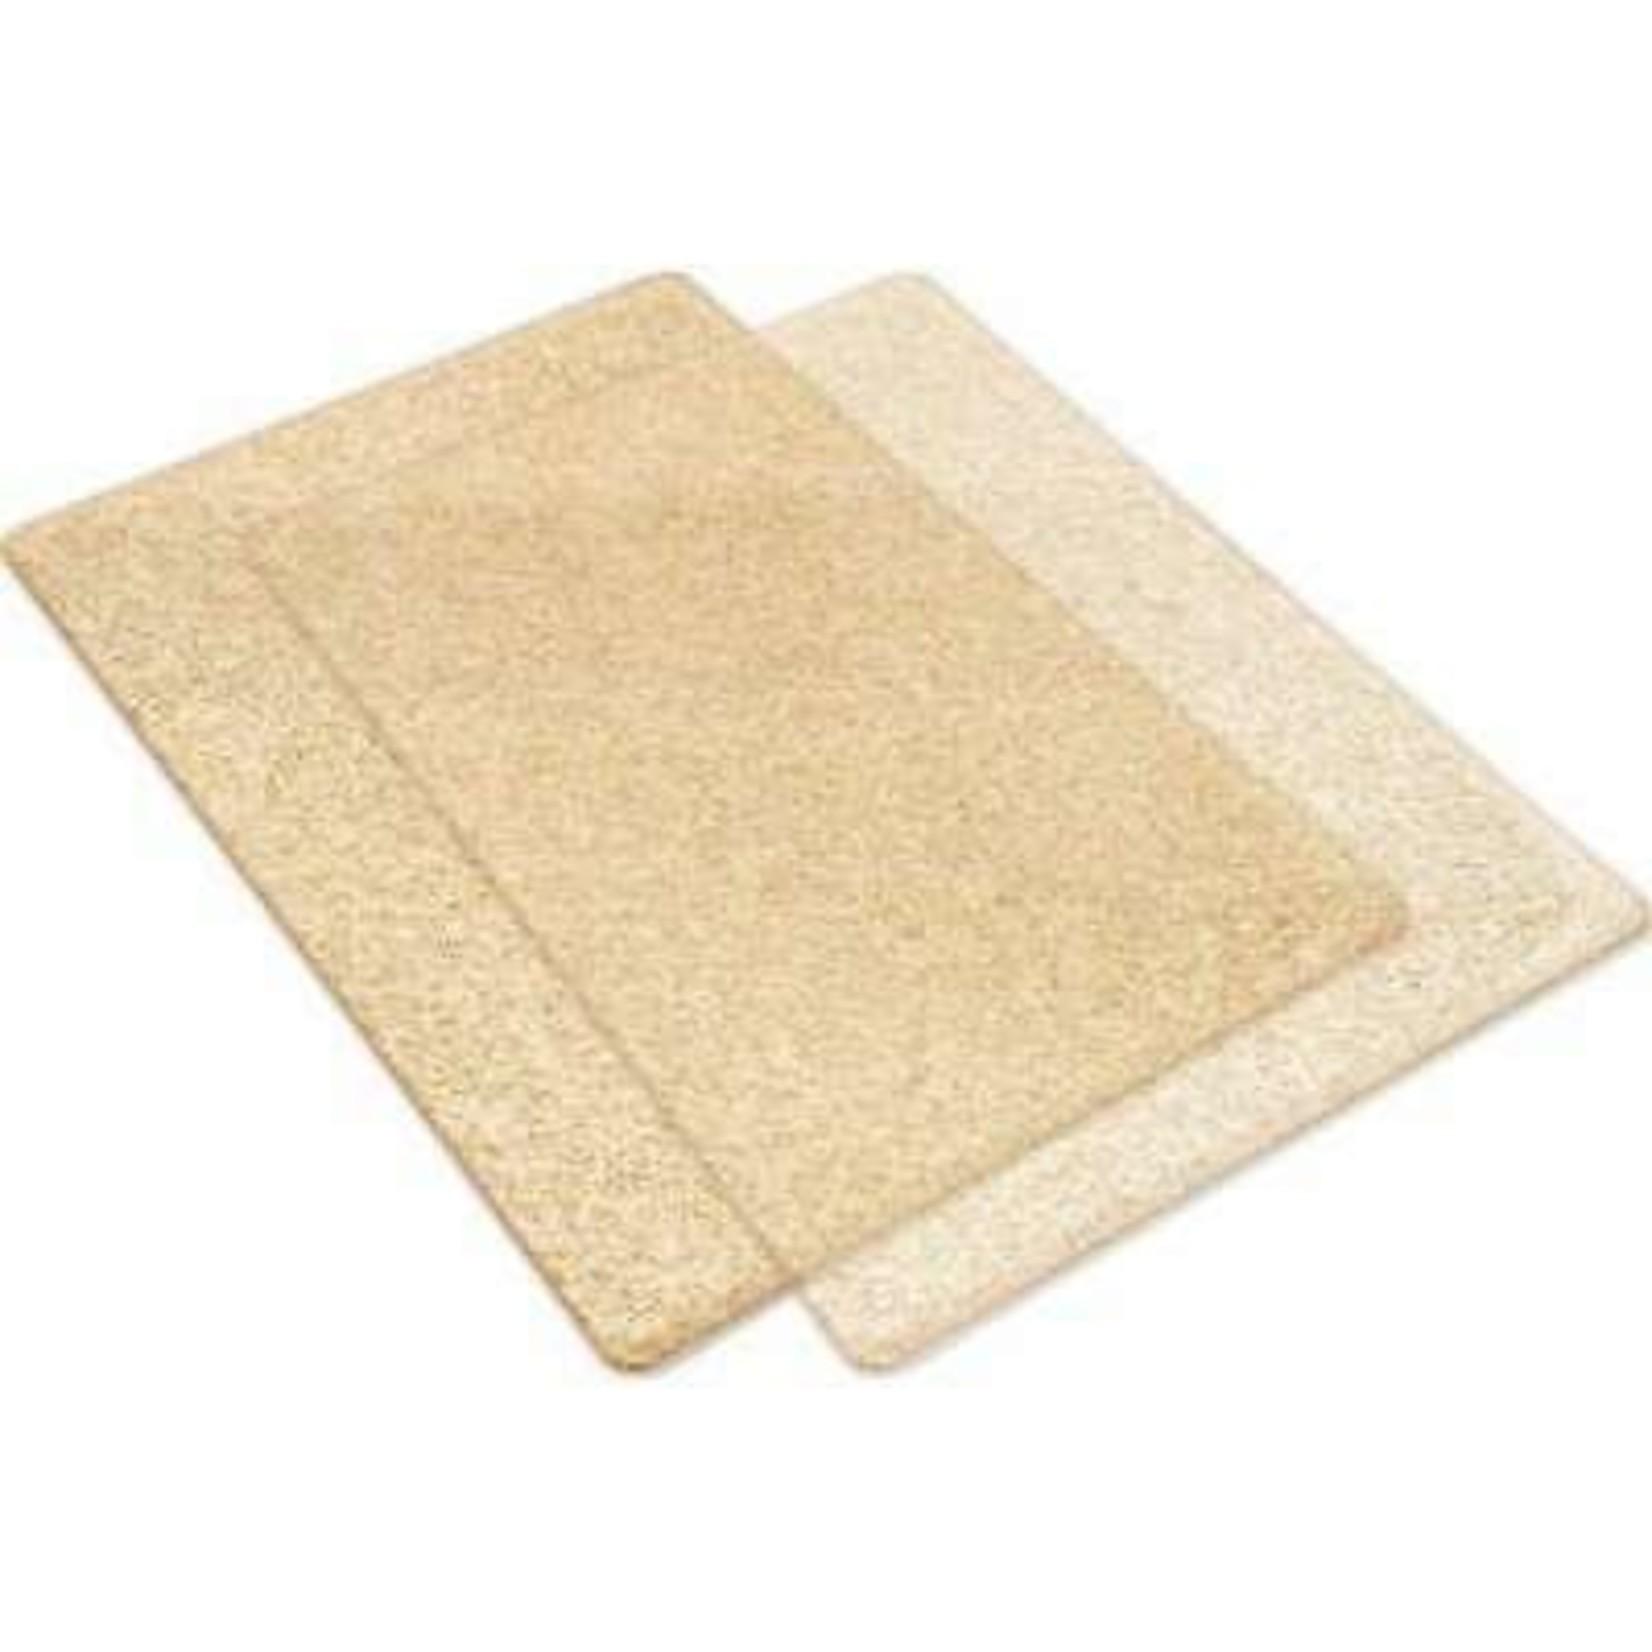 Sizzix Sizzix - Glitter Cutting Pads Standard - Gold